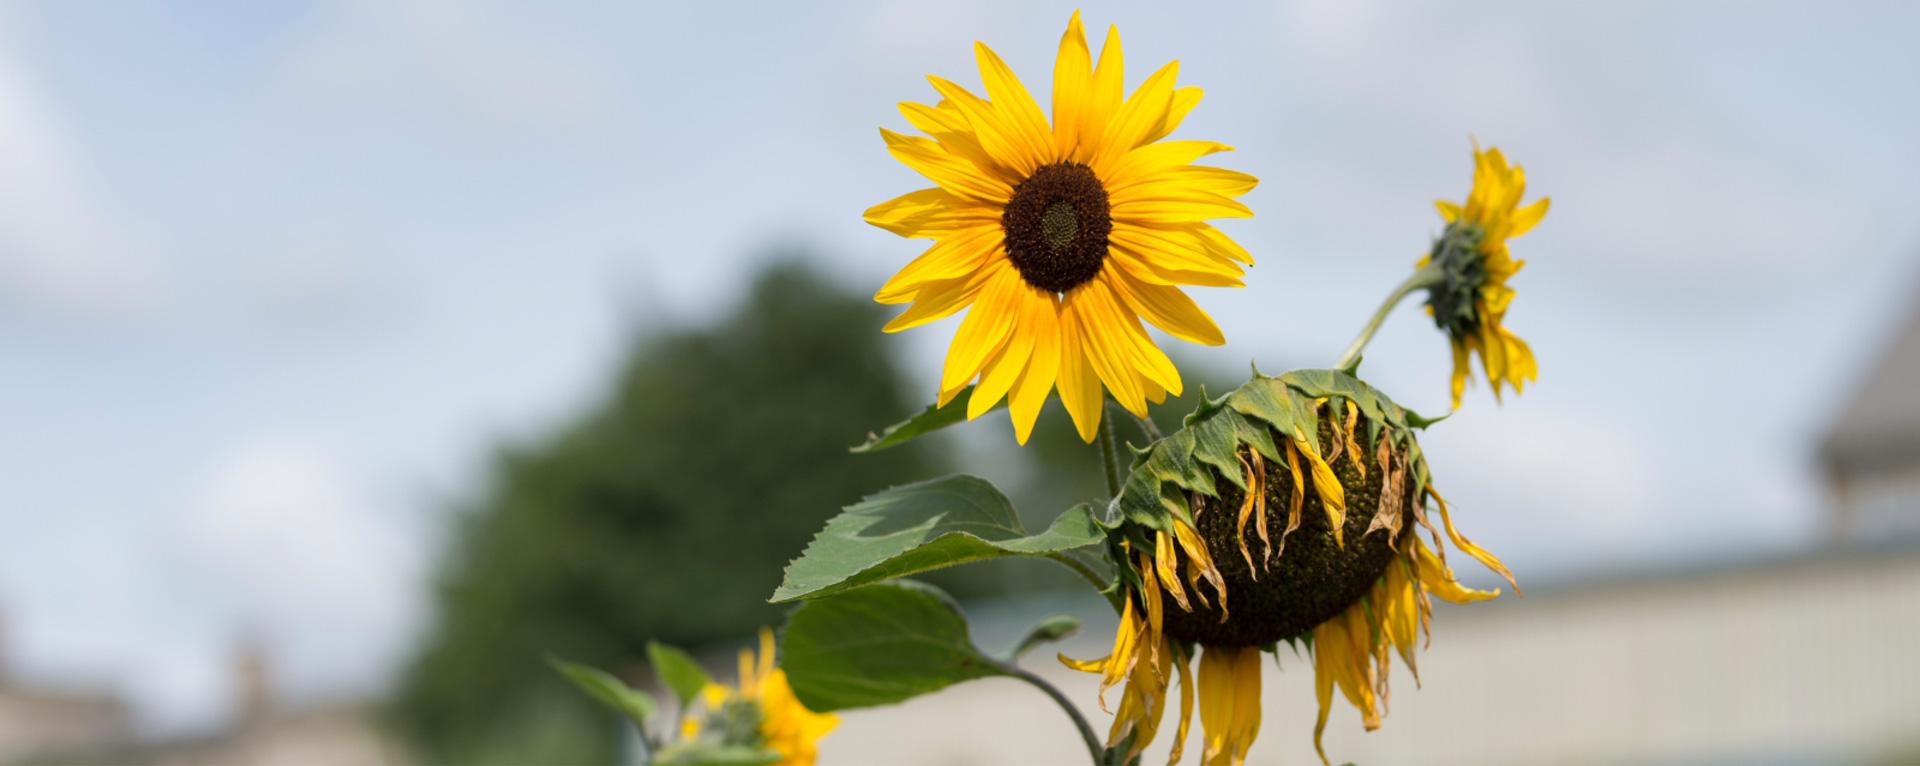 sliders_sunflower